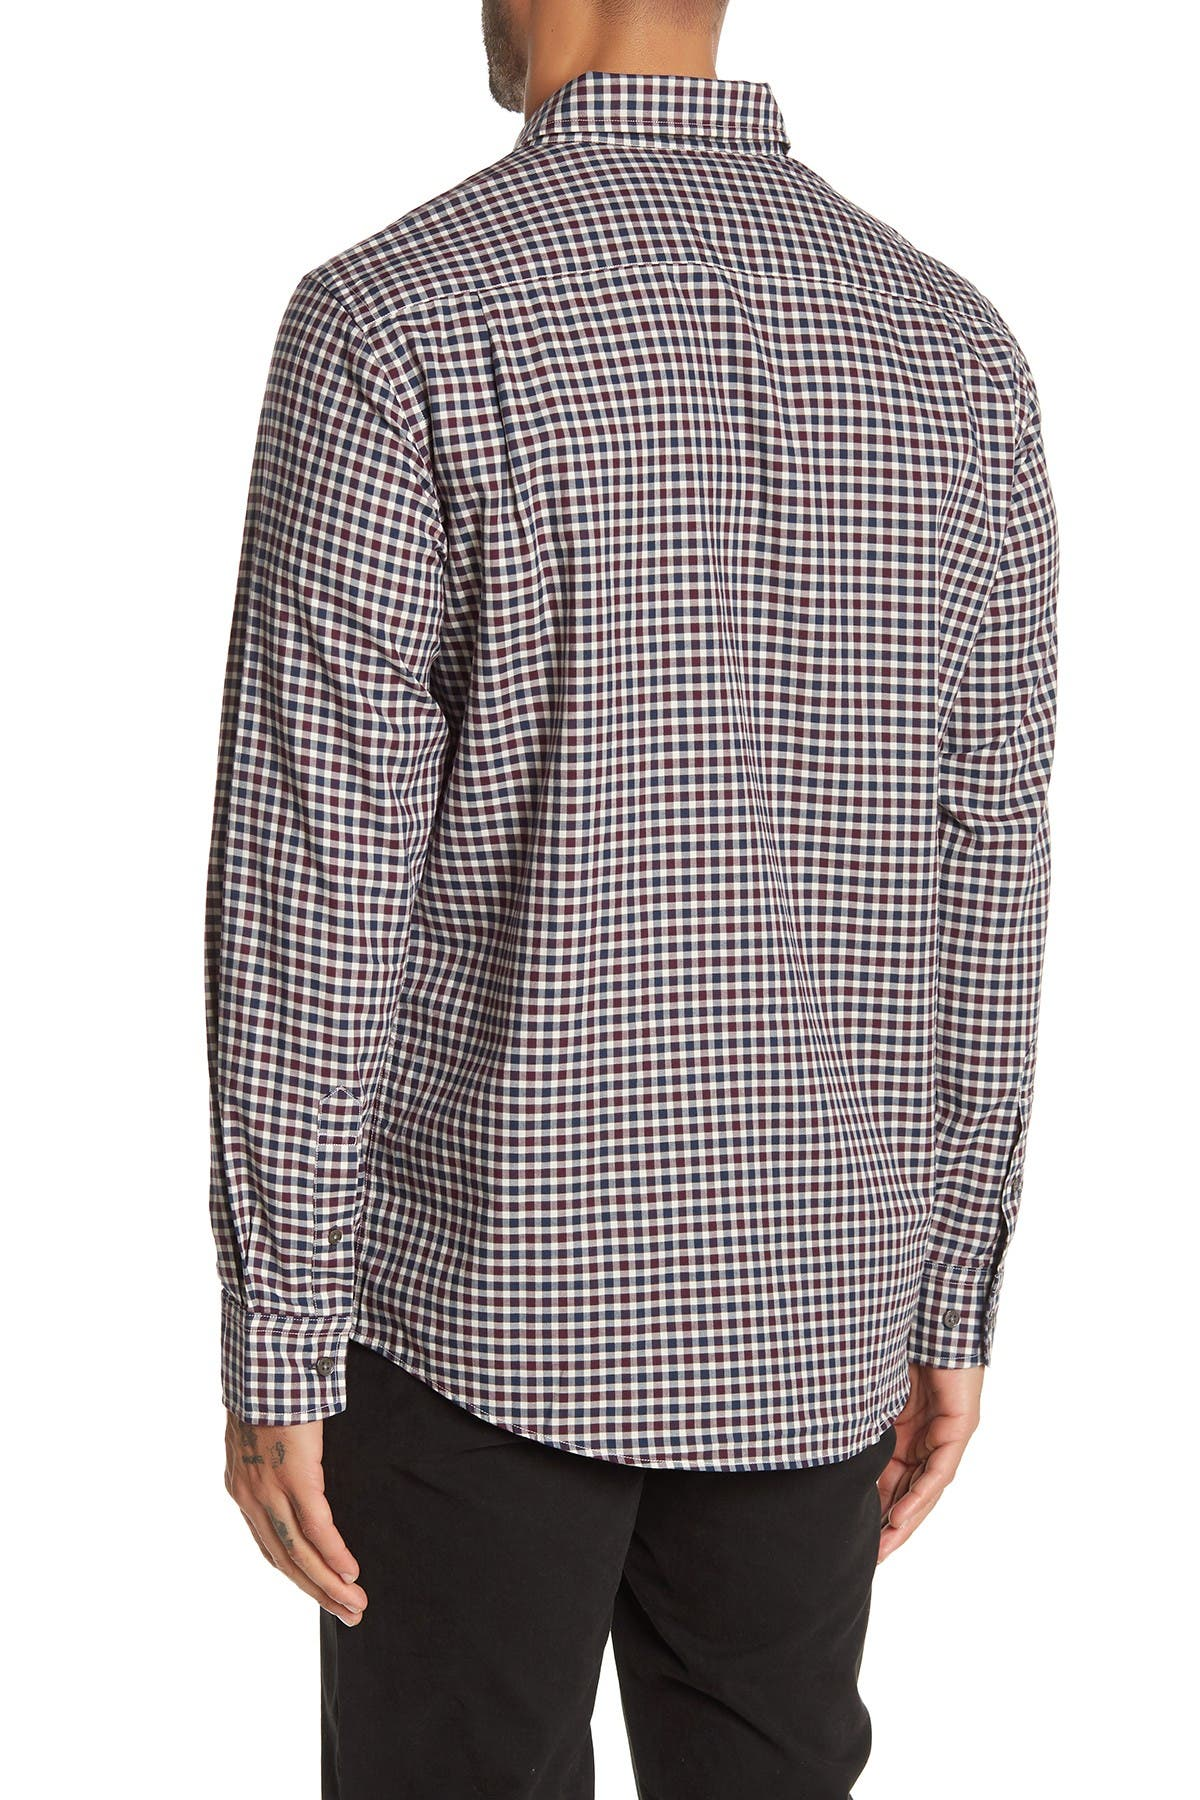 Image of RODD AND GUNN Huntly Long Sleeve Original Fit Shirt